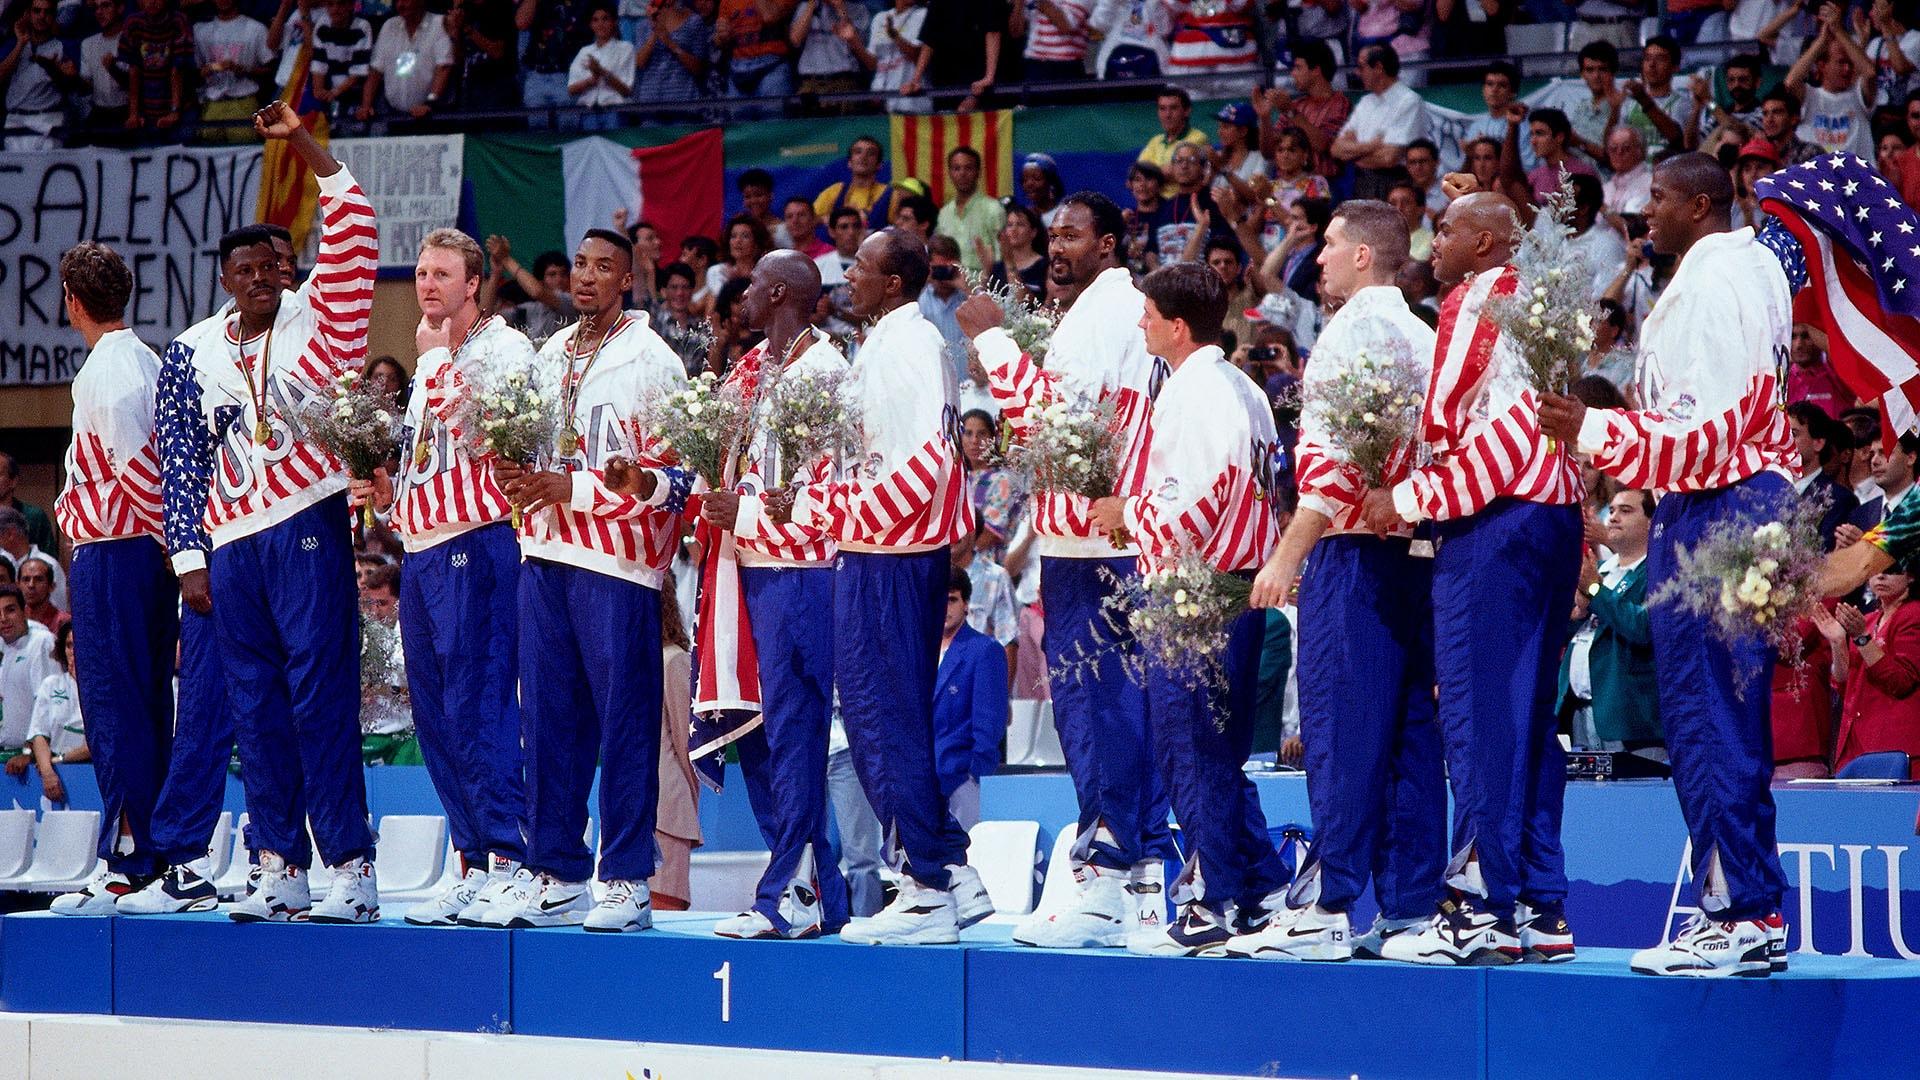 Hall of Fame: Dream Team